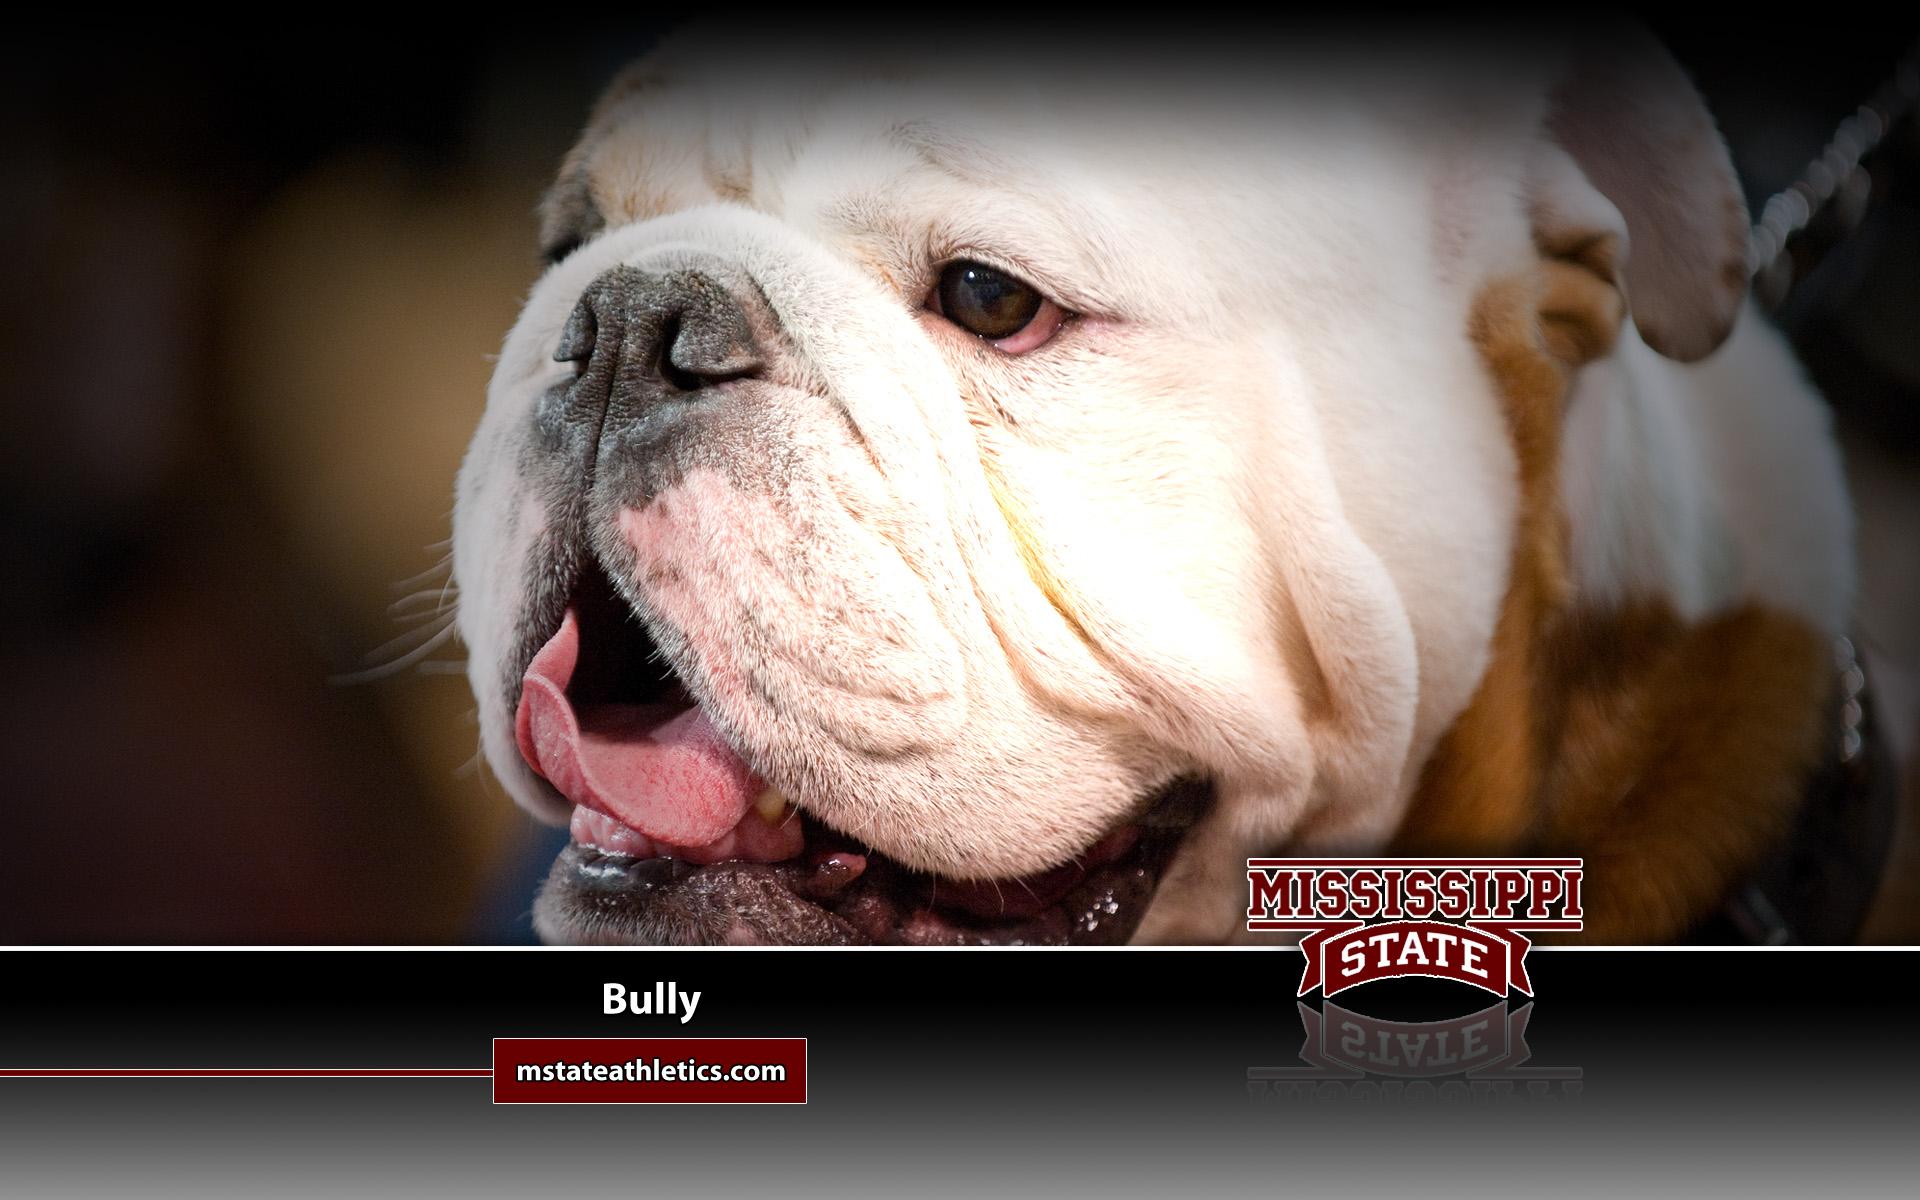 Mississippi State University Bulldog wallpaper   236499 1920x1200